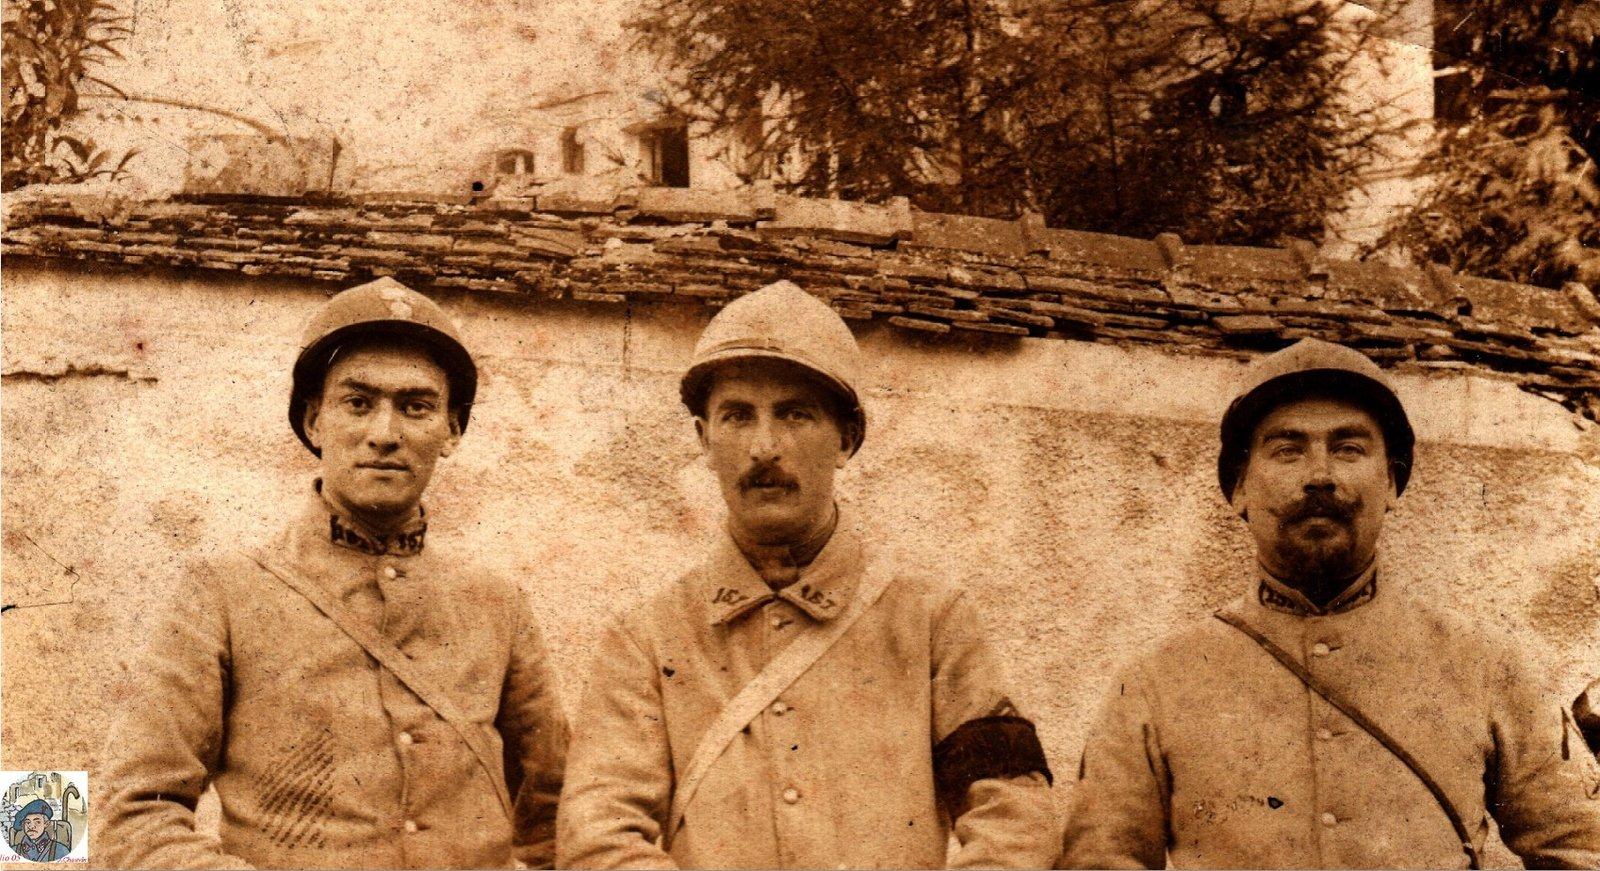 157ri mitrailleur 1915(2)